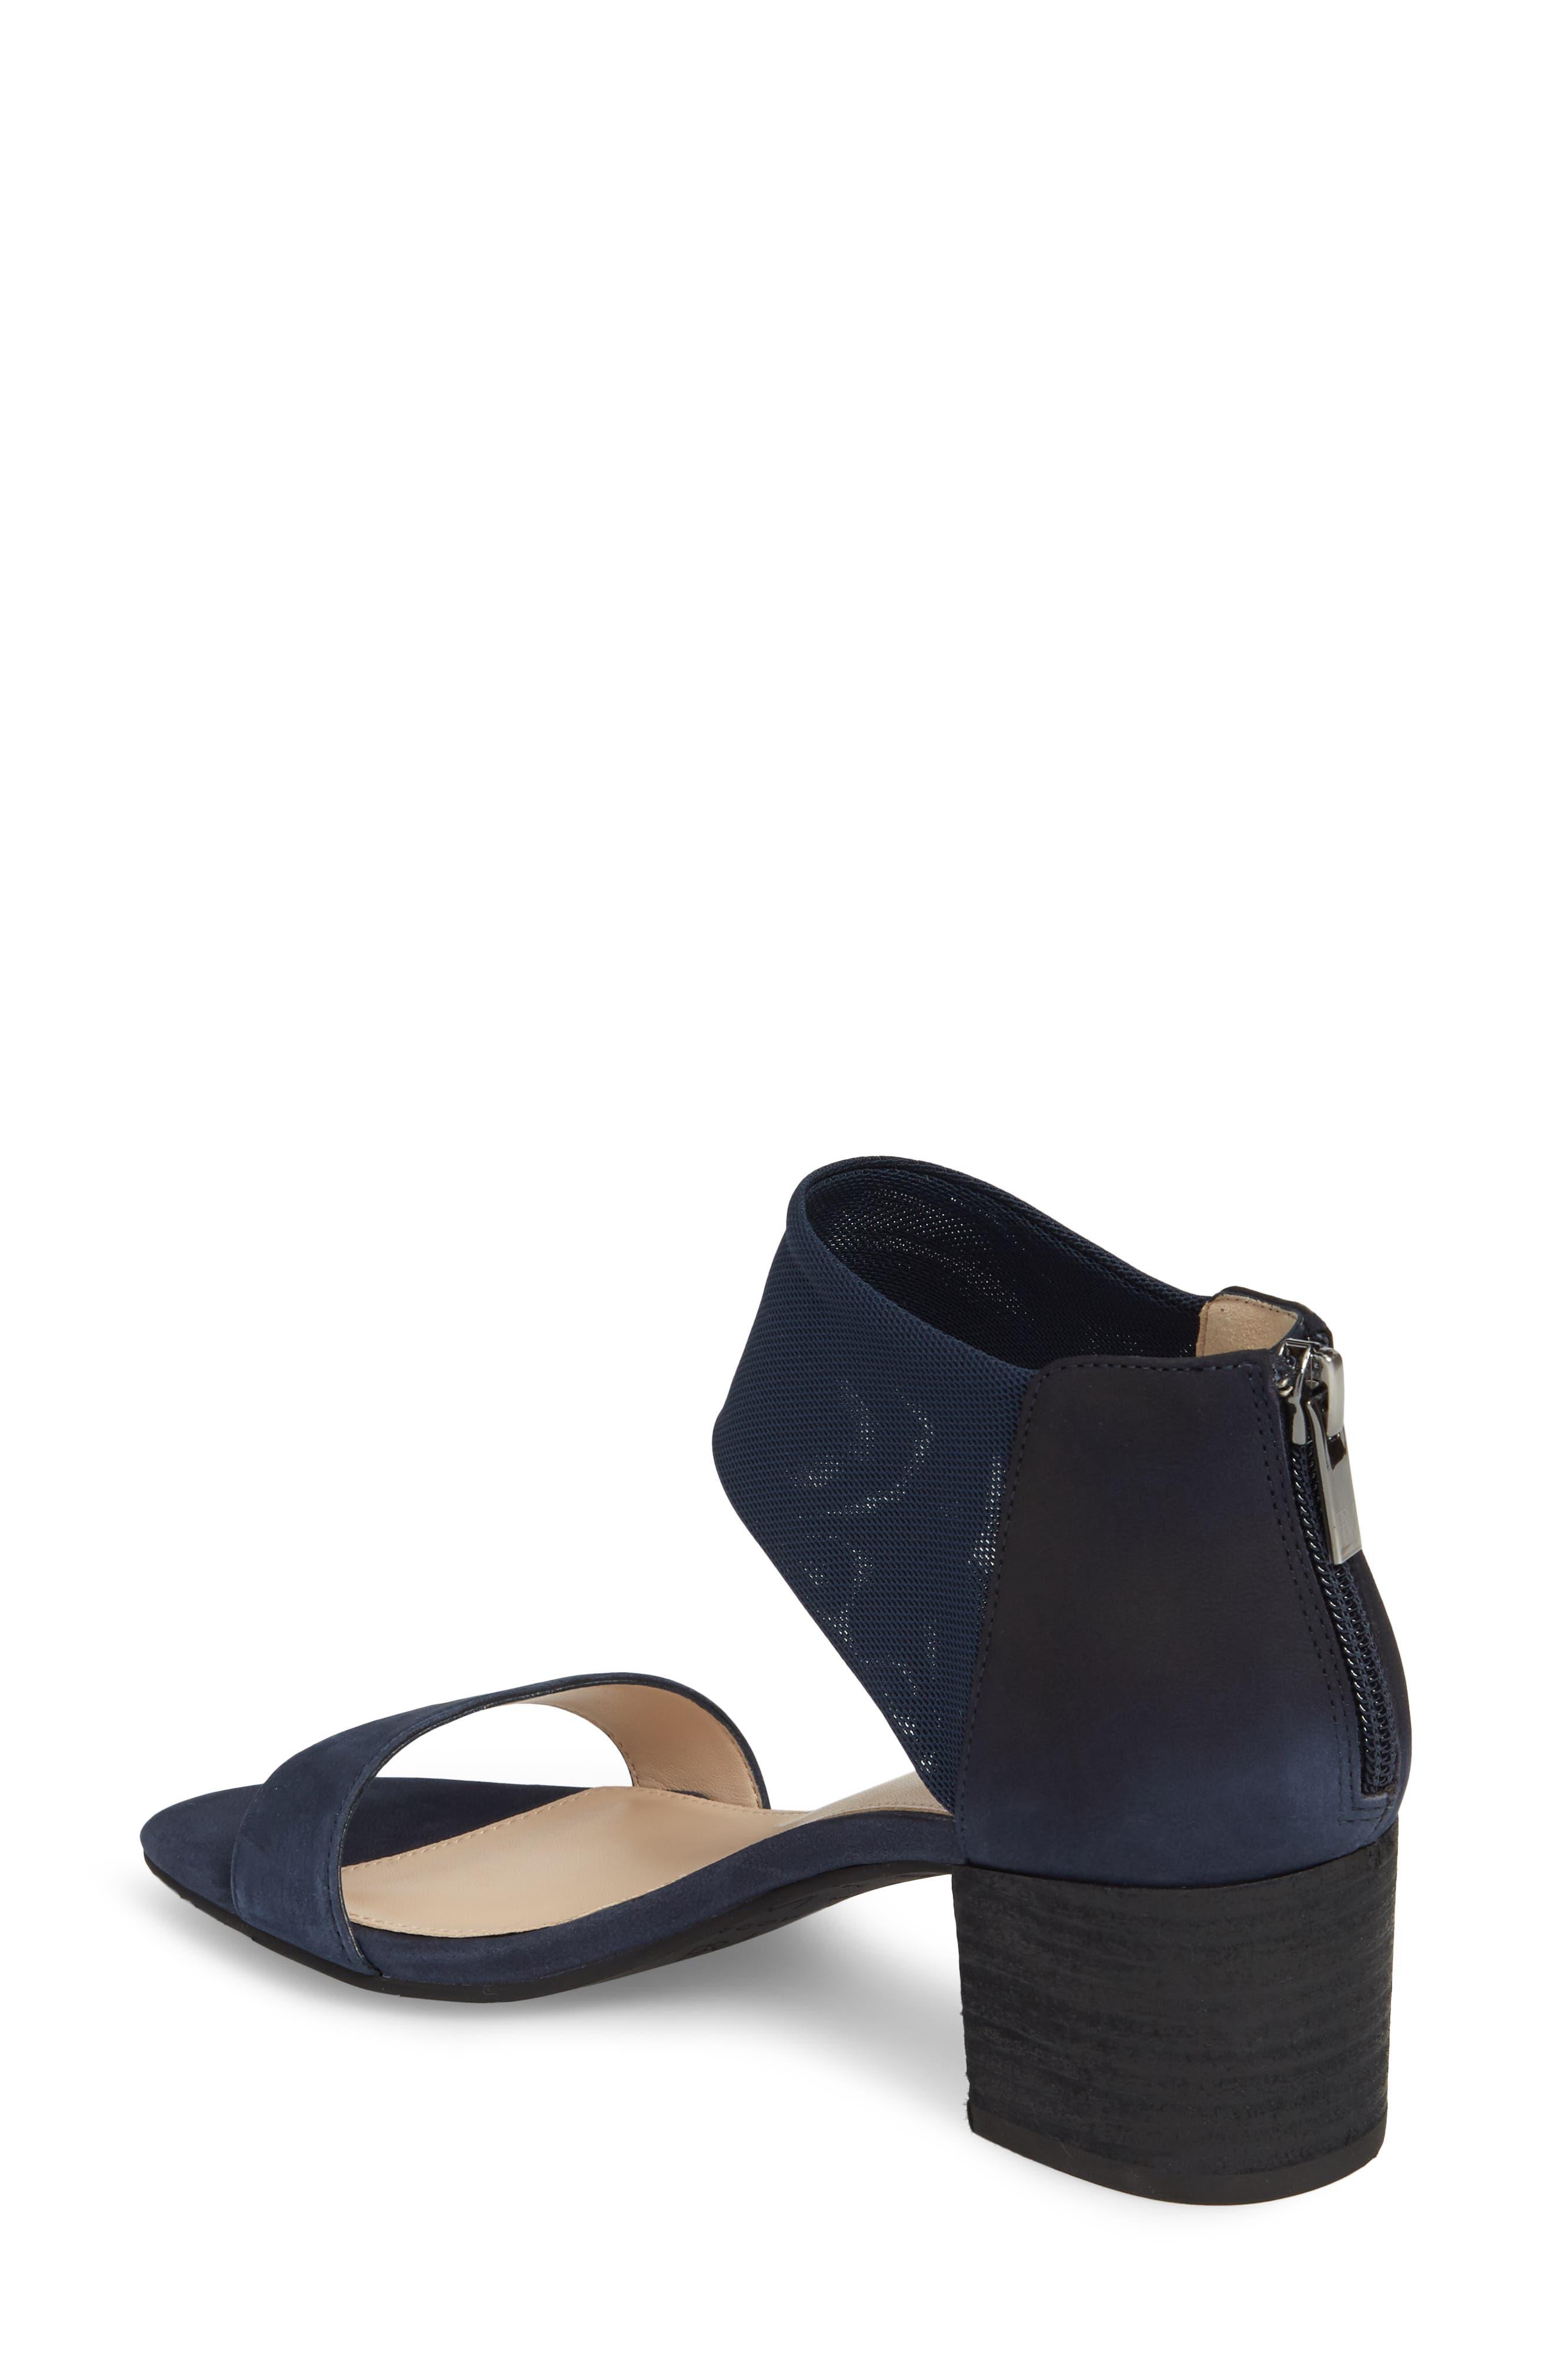 Alden Mesh Strap Sandal,                             Alternate thumbnail 2, color,                             Midnight Nubuck Leather